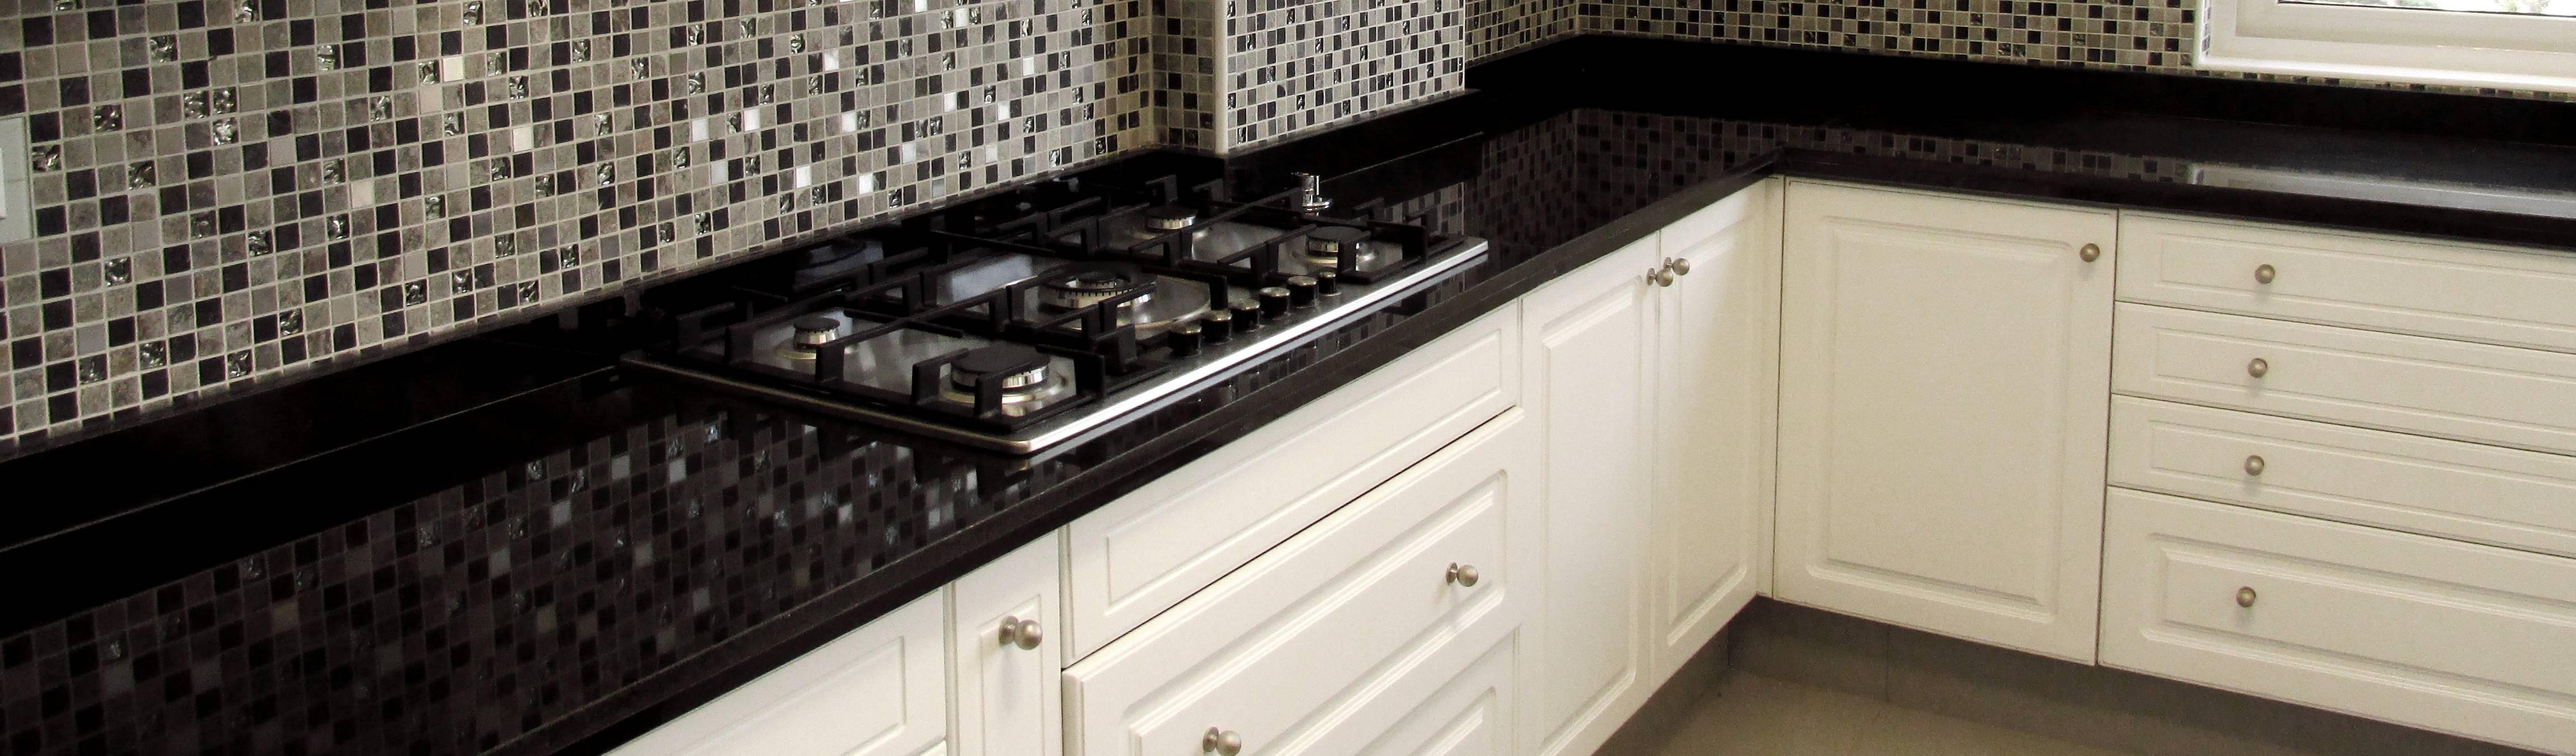 Abs dise os muebles fabricantes de cocinas en santiago for Muebles santiago aranjuez